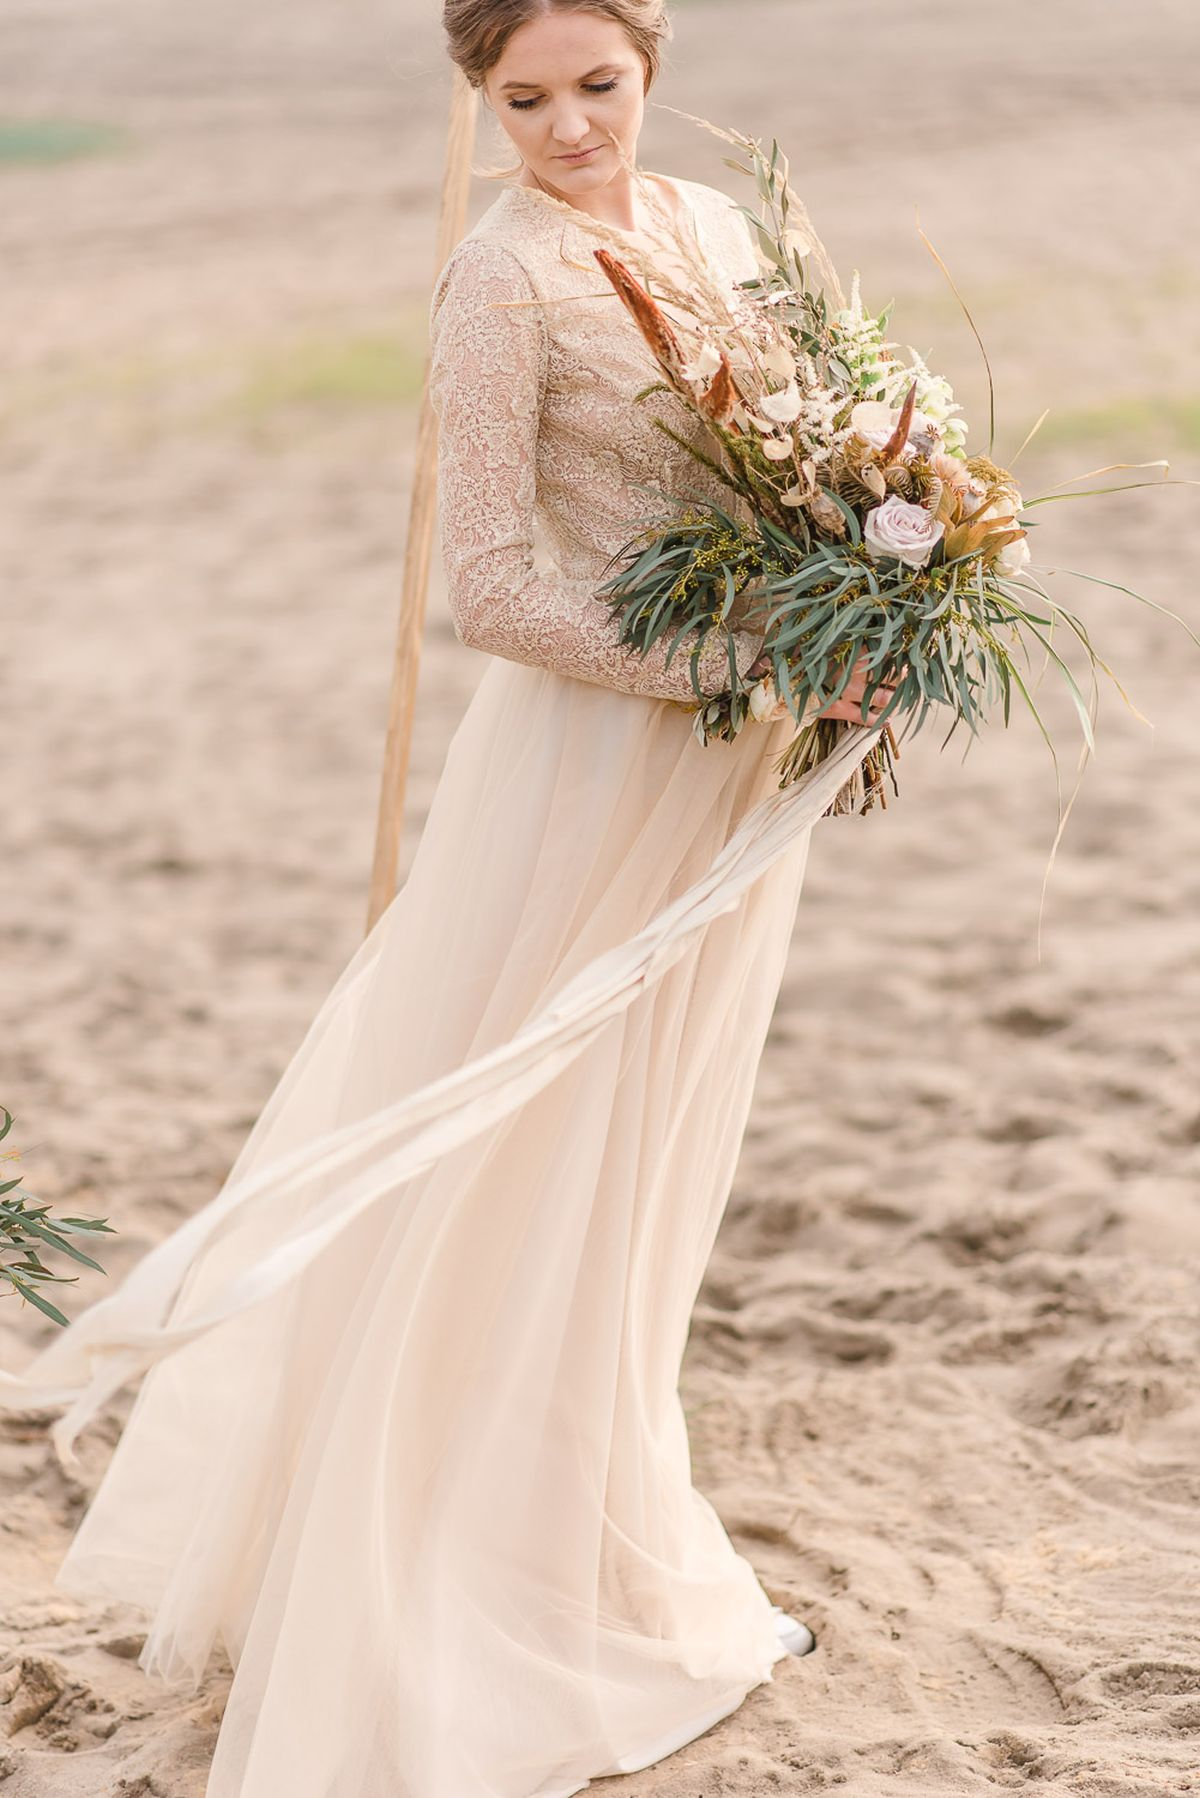 aschaaa-photography-wedding-shoot-wüste (98)